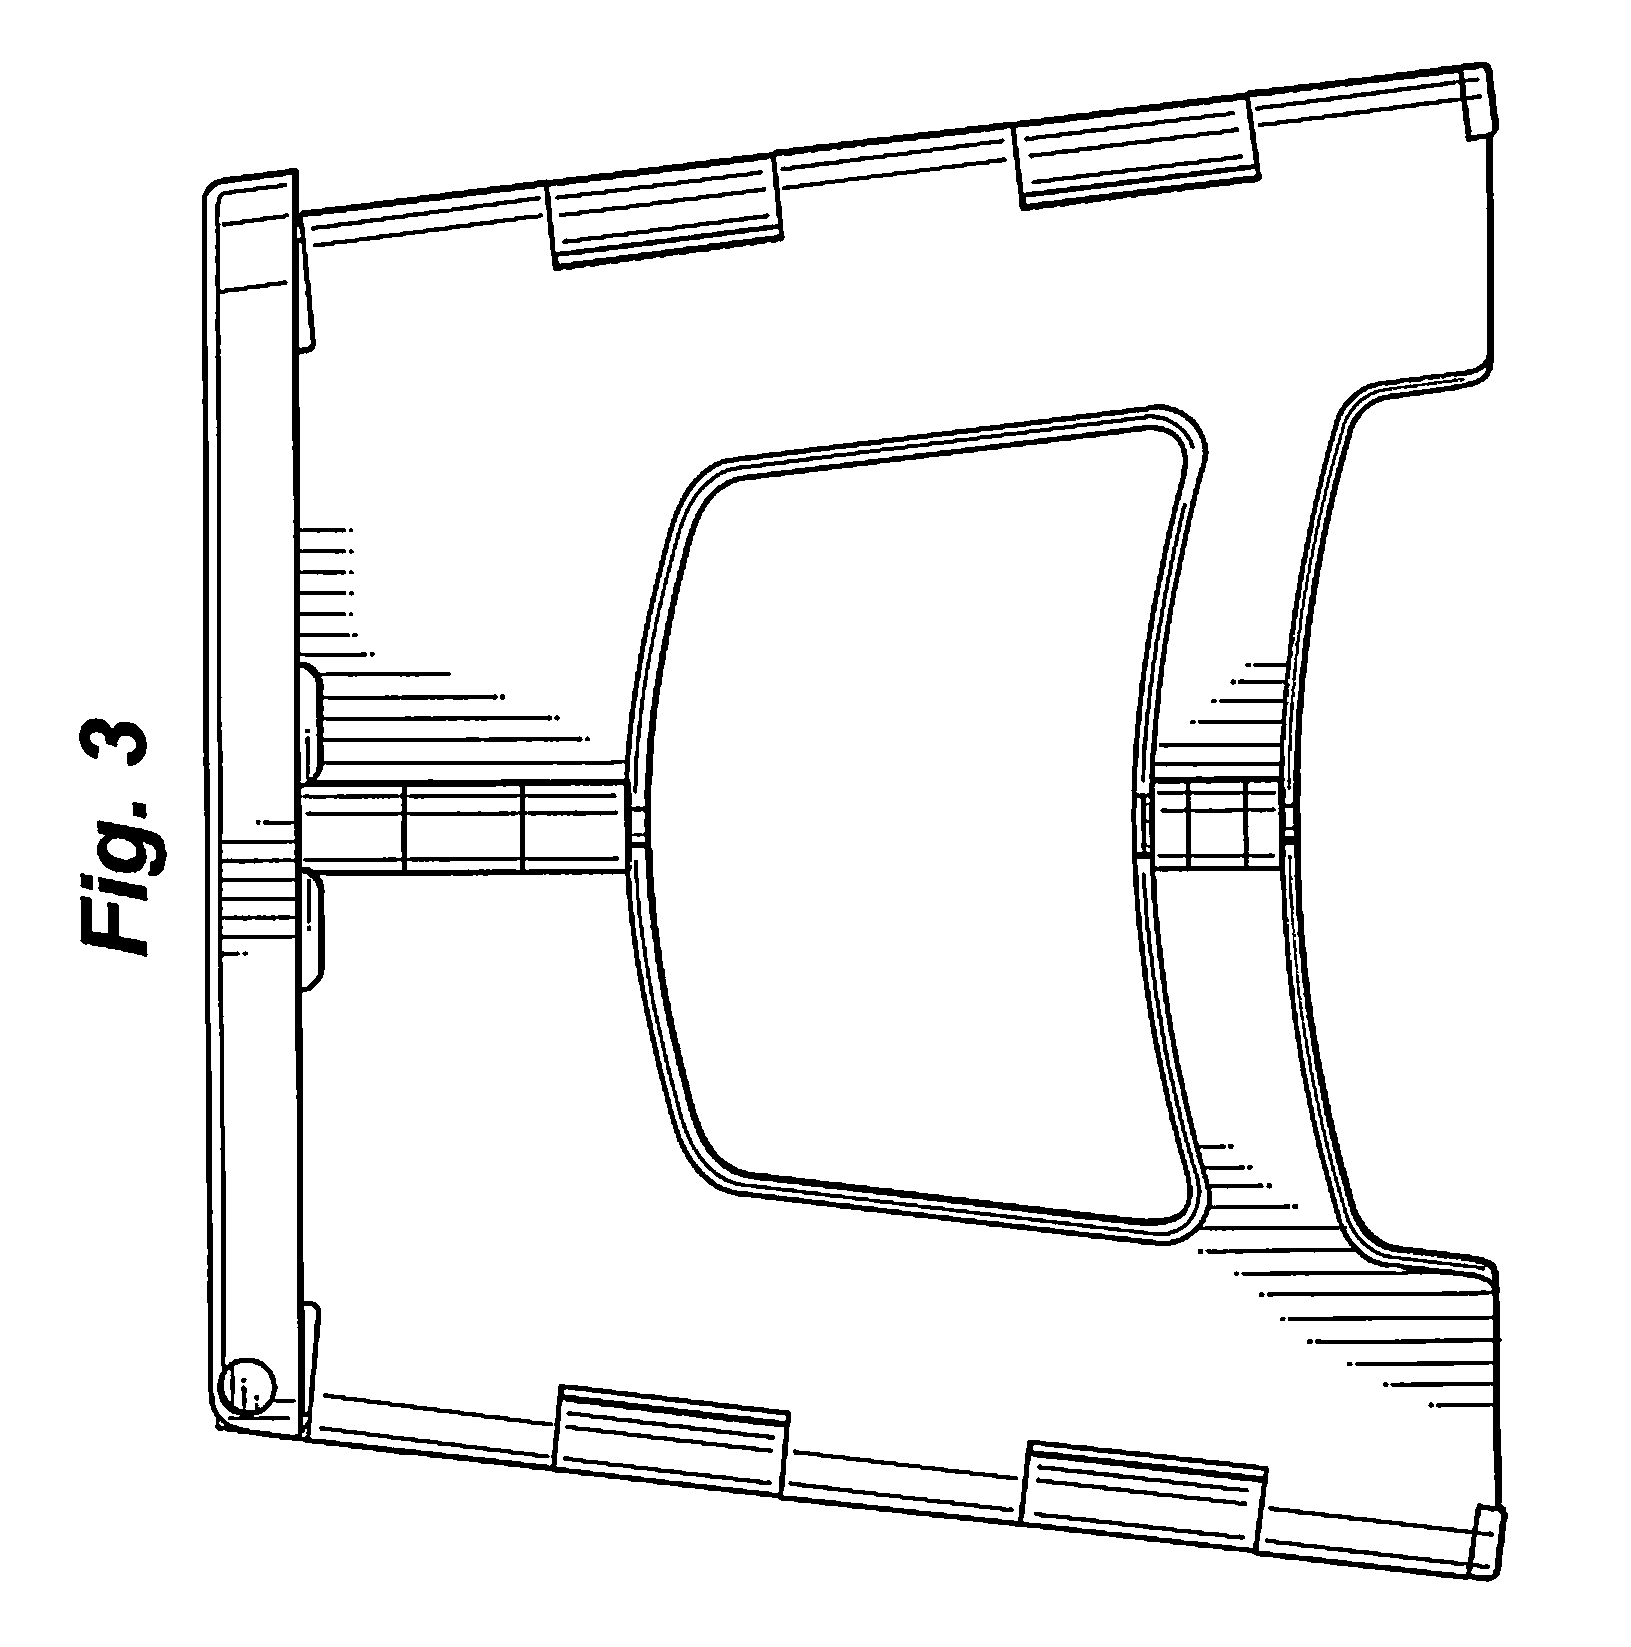 Patent Usd710031 Step Stool Google Patents